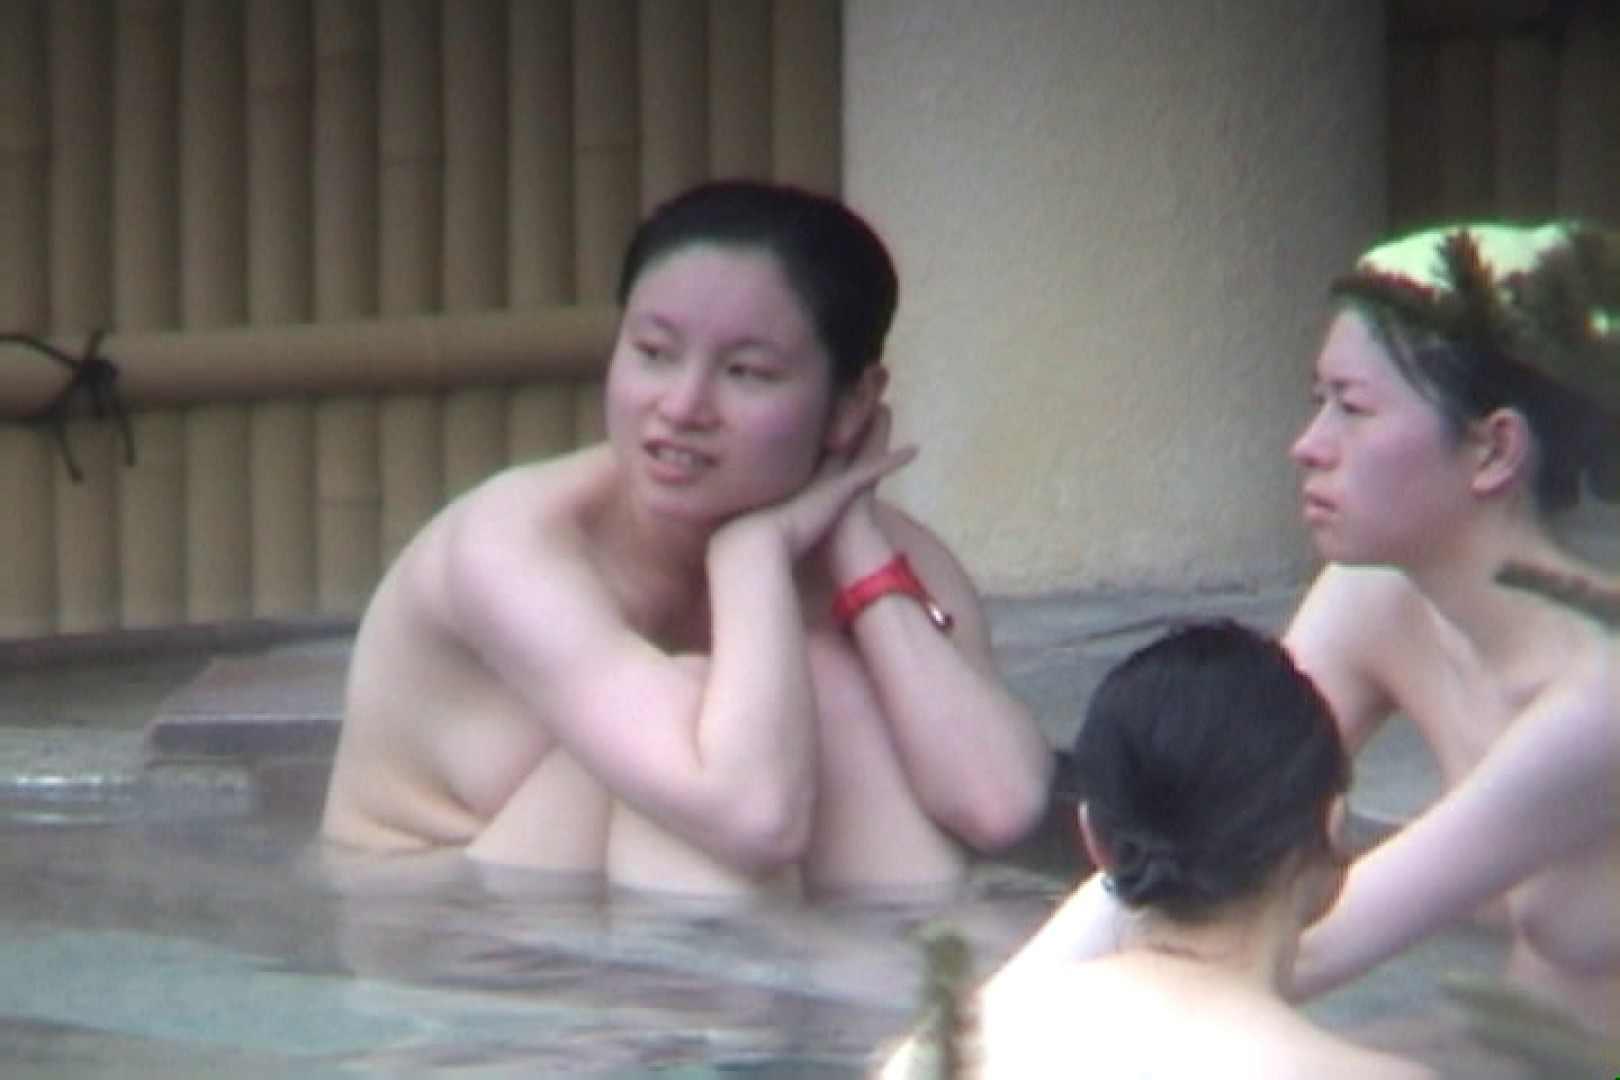 Aquaな露天風呂Vol.45【VIP限定】 HなOL   盗撮  100pic 40